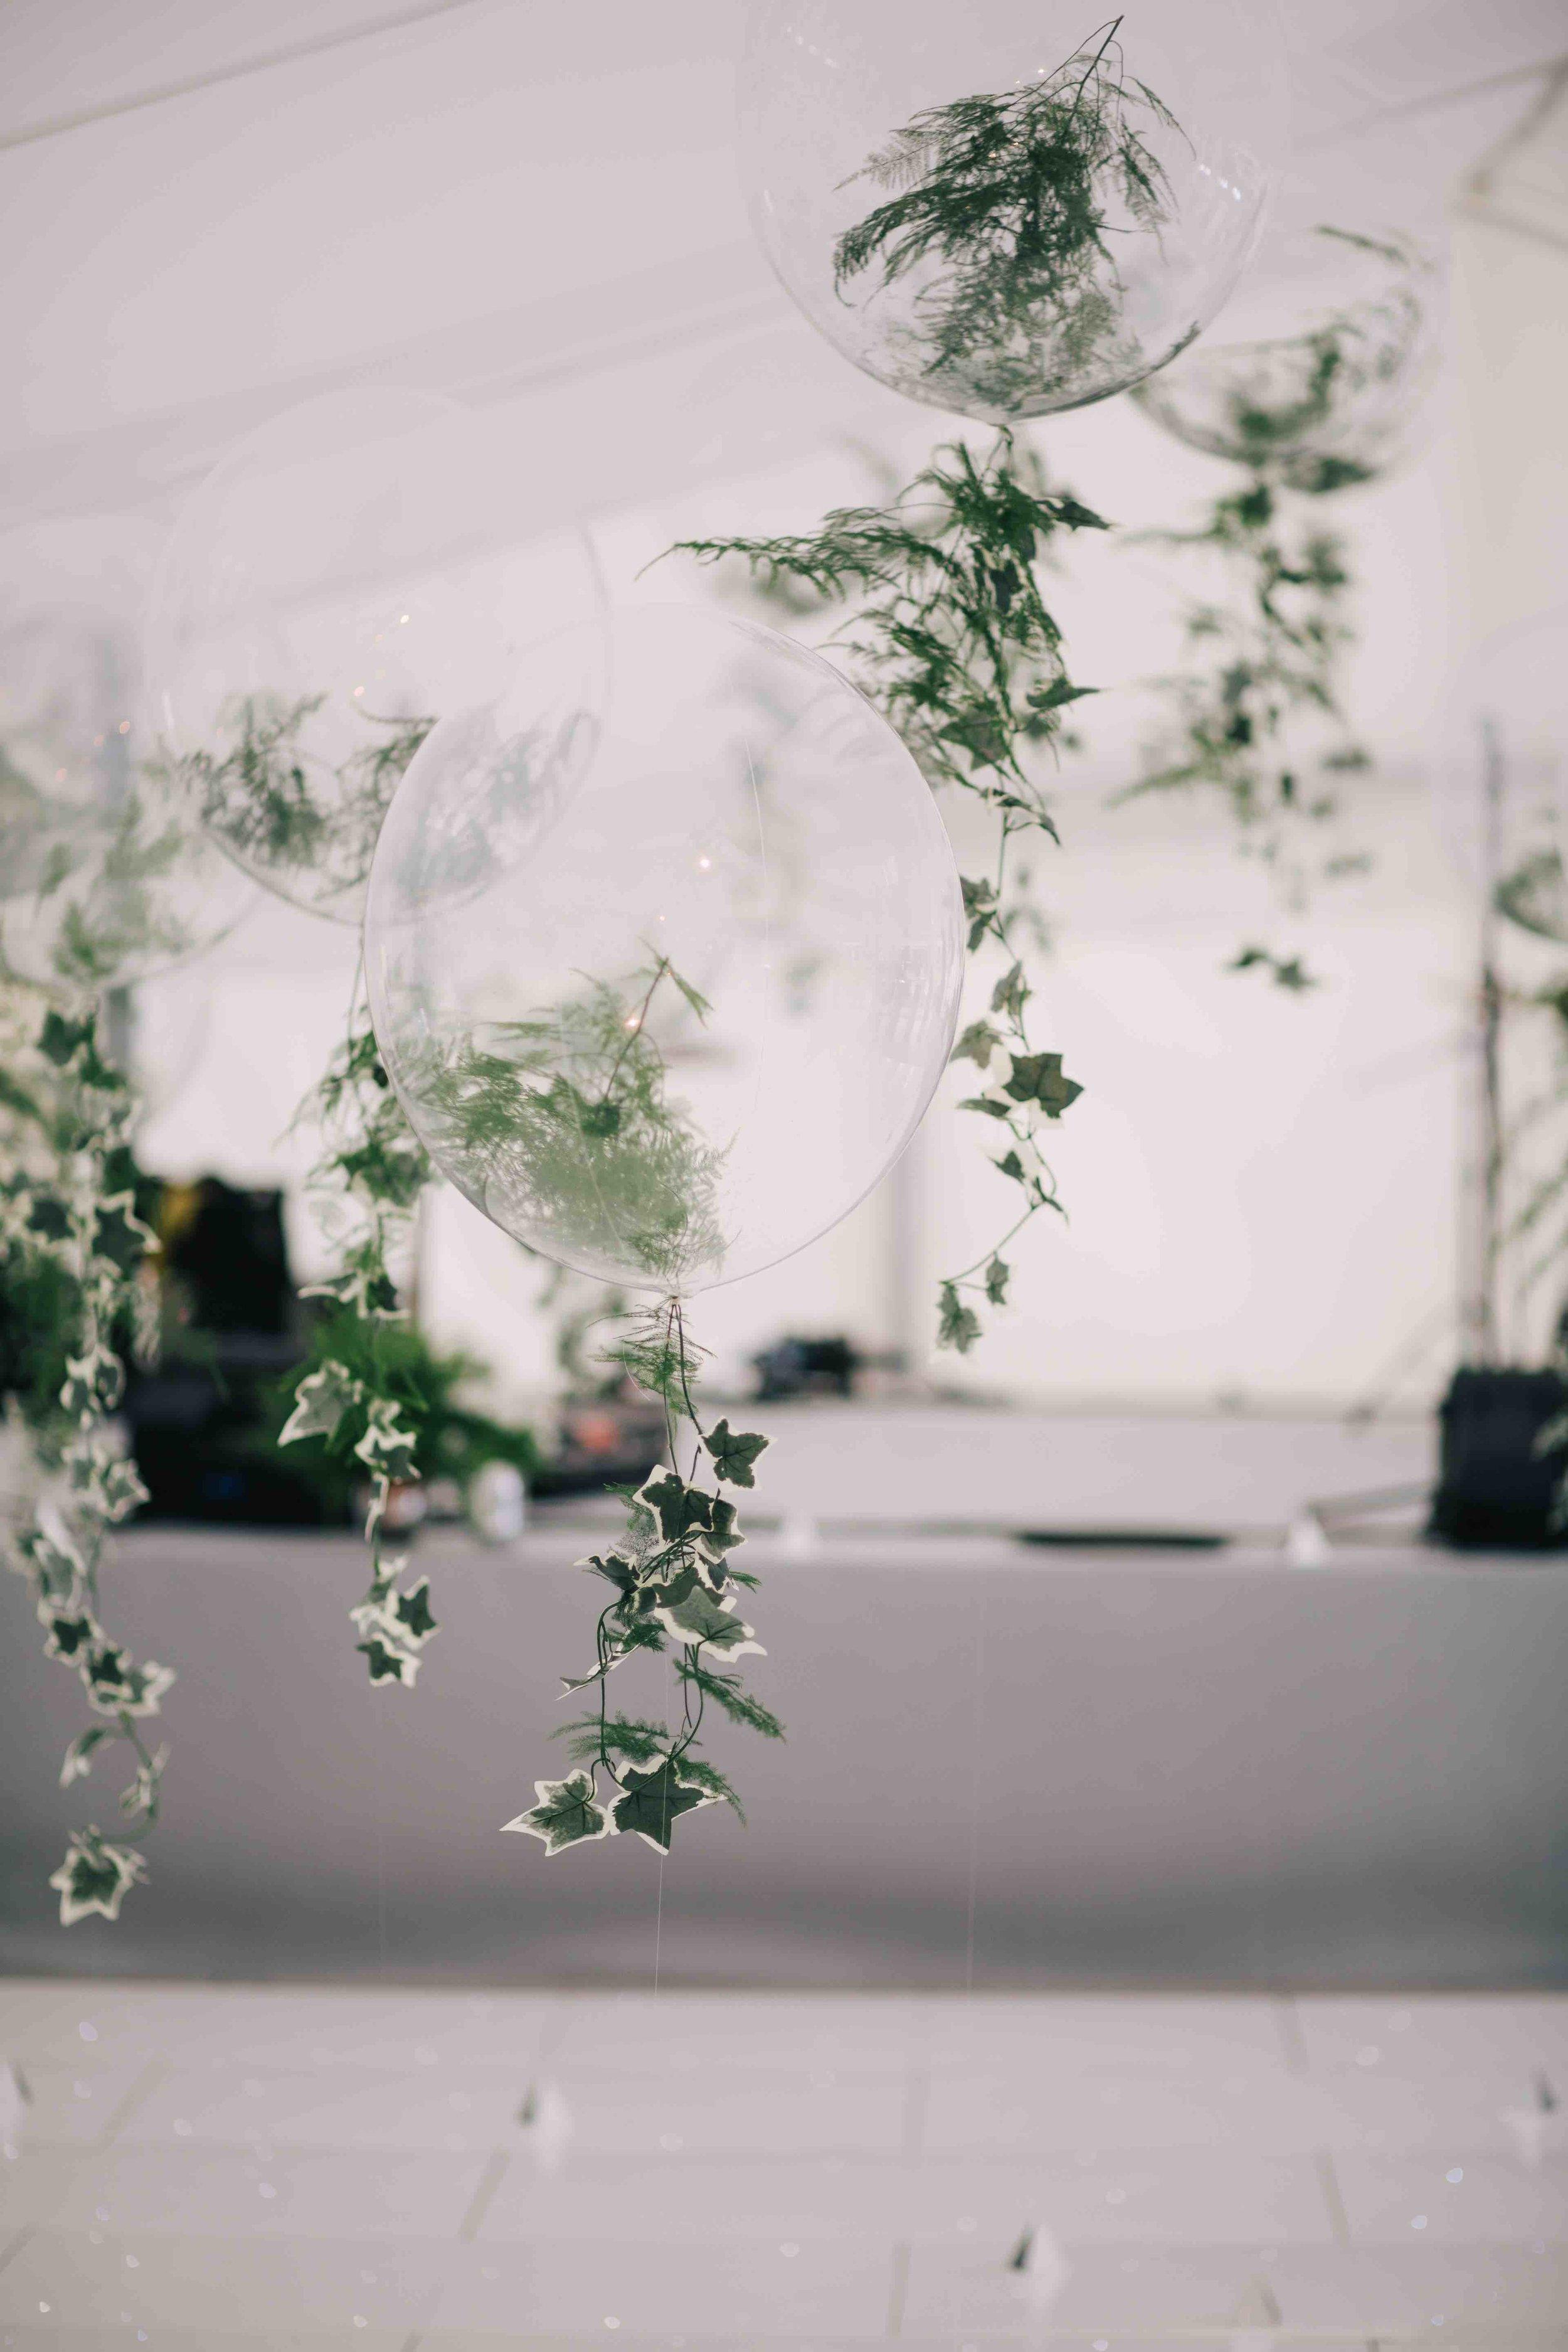 Littleton-Rose-Botanical-Wedding-Cornwall-Wedding-Planners-Balloons.jpg